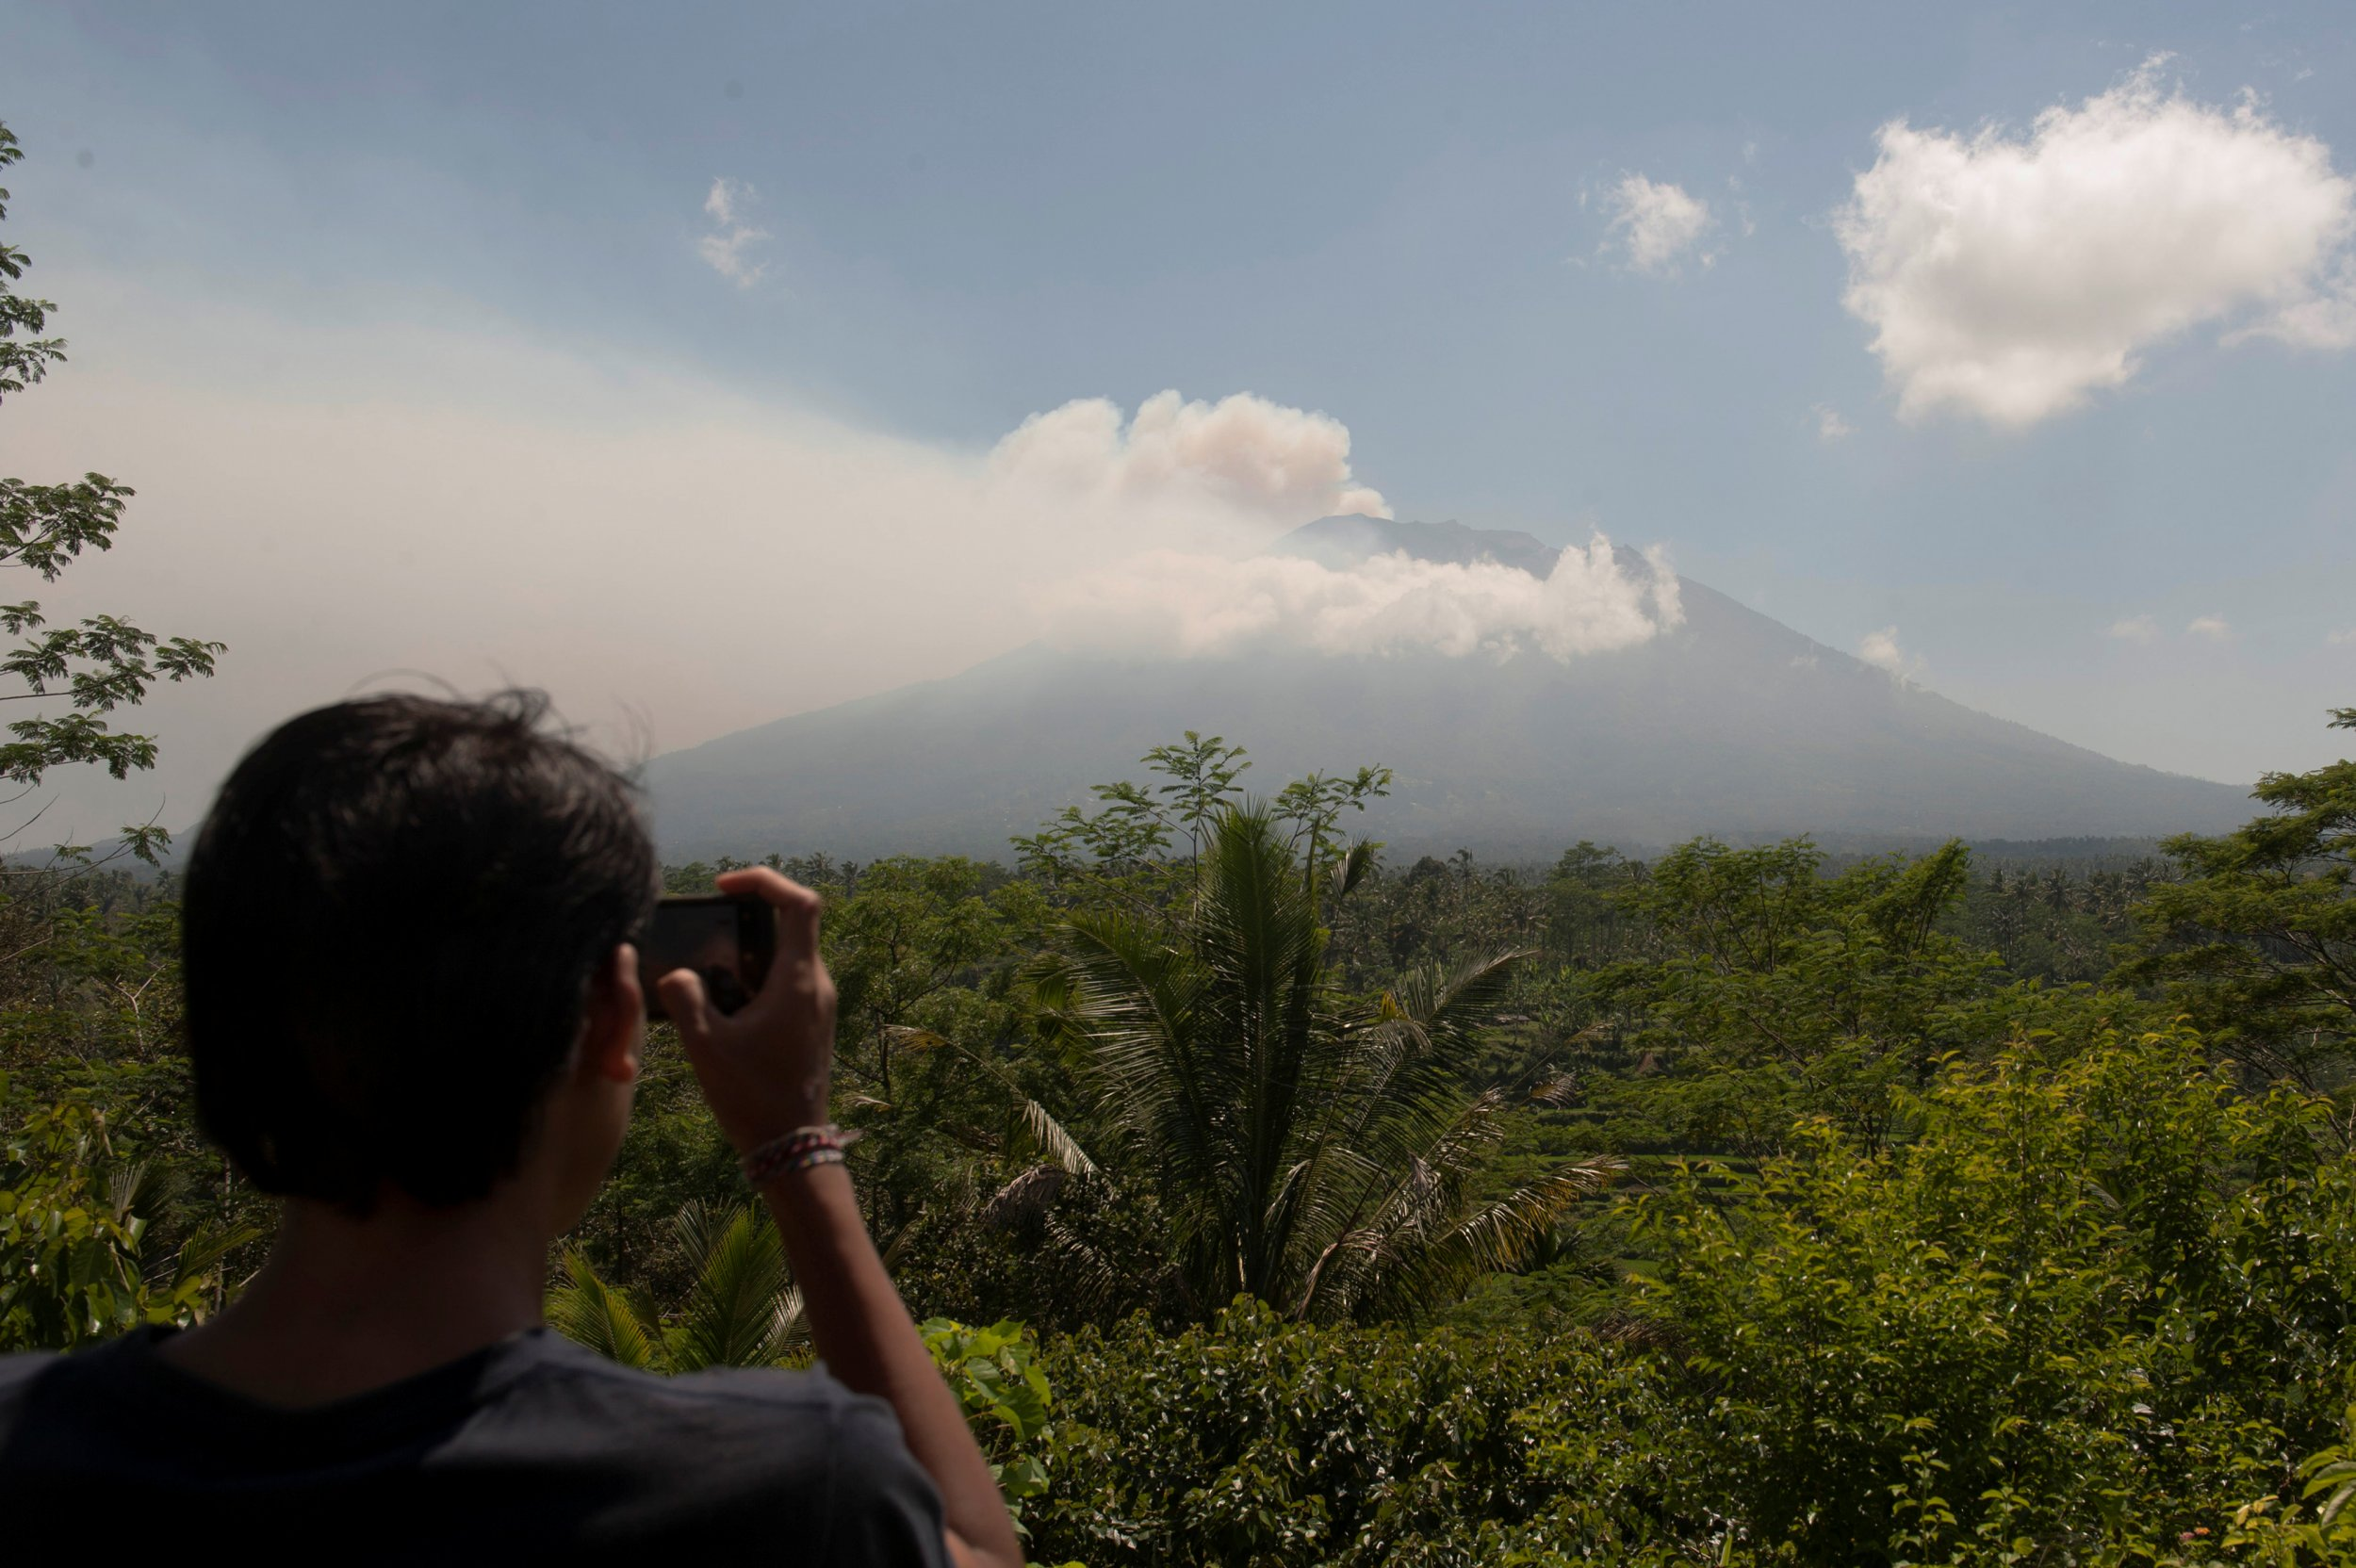 09_22_Bali_Volcano_Agung